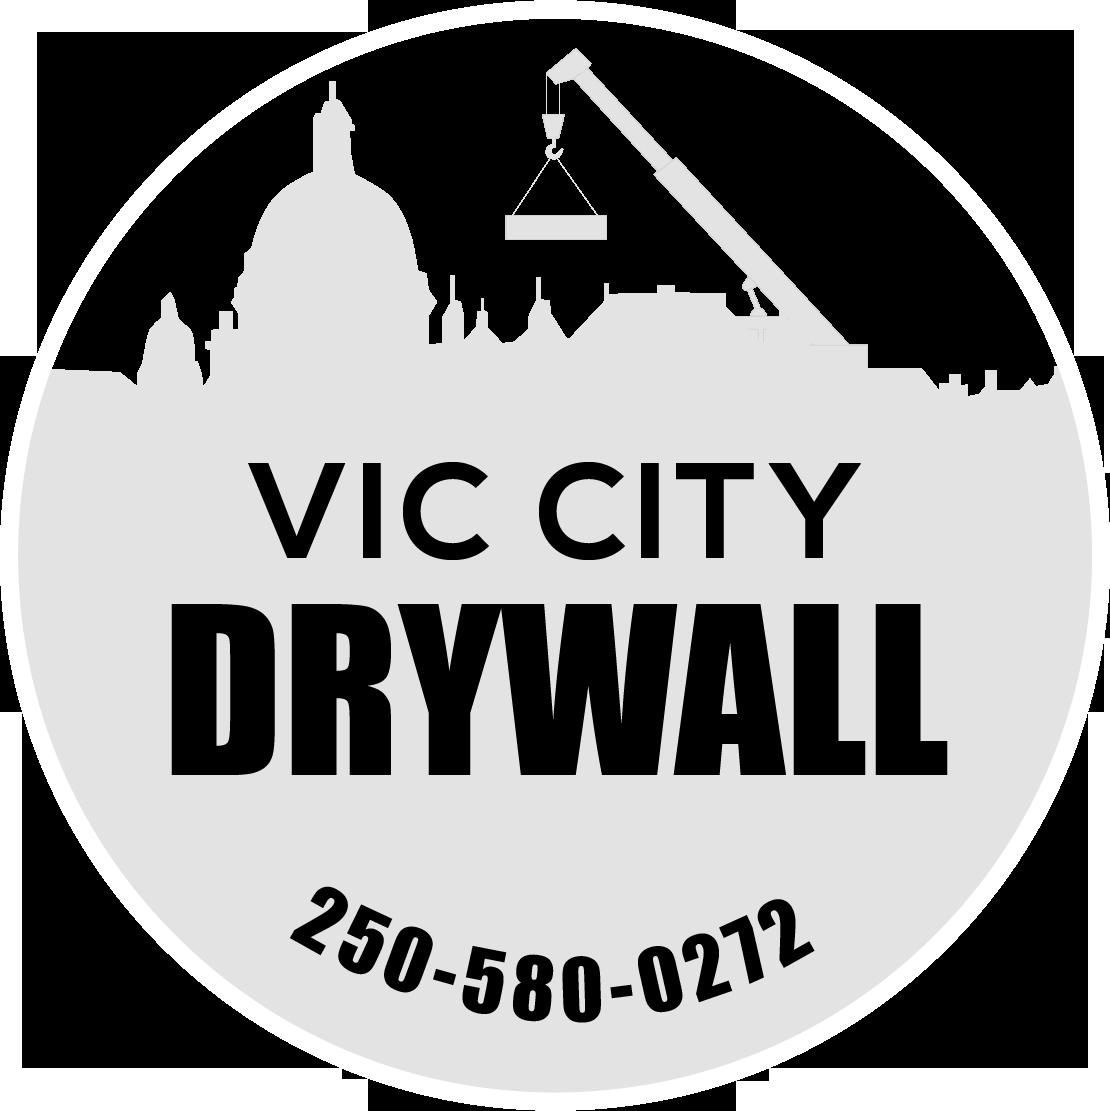 viccity logo